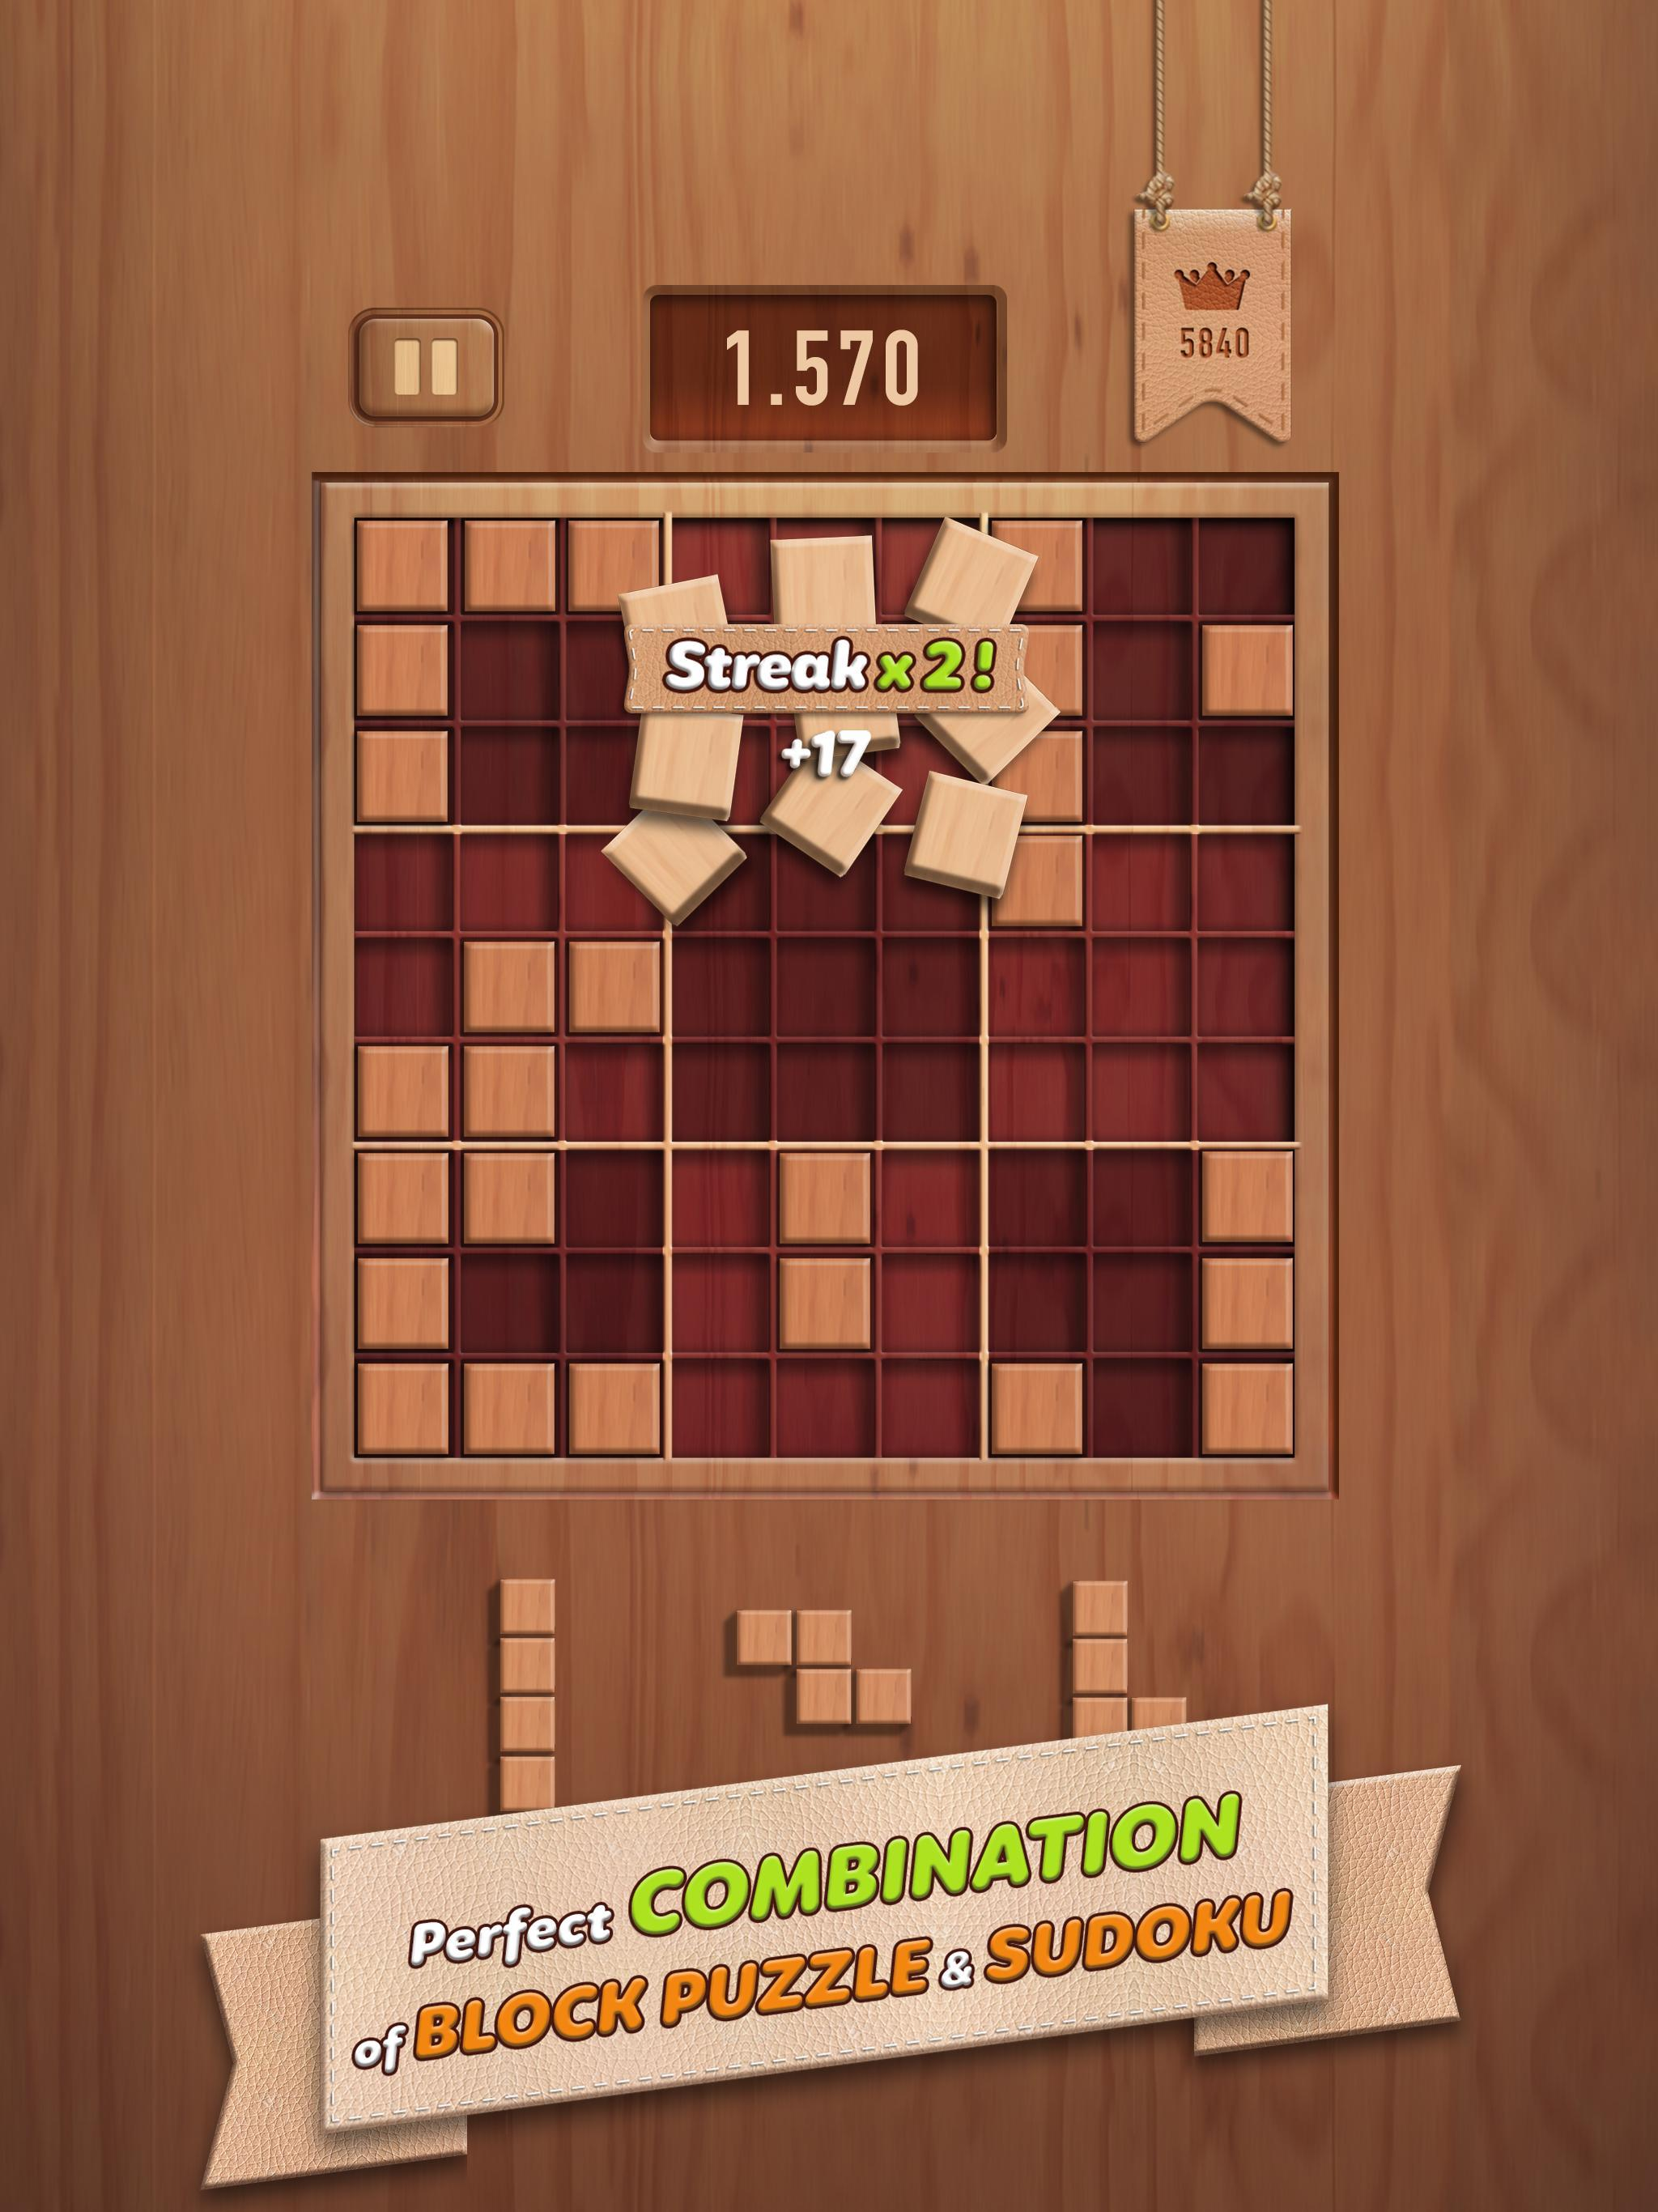 Woody 99 Sudoku Block Puzzle - Free Mind Games 1.2.2 Screenshot 7